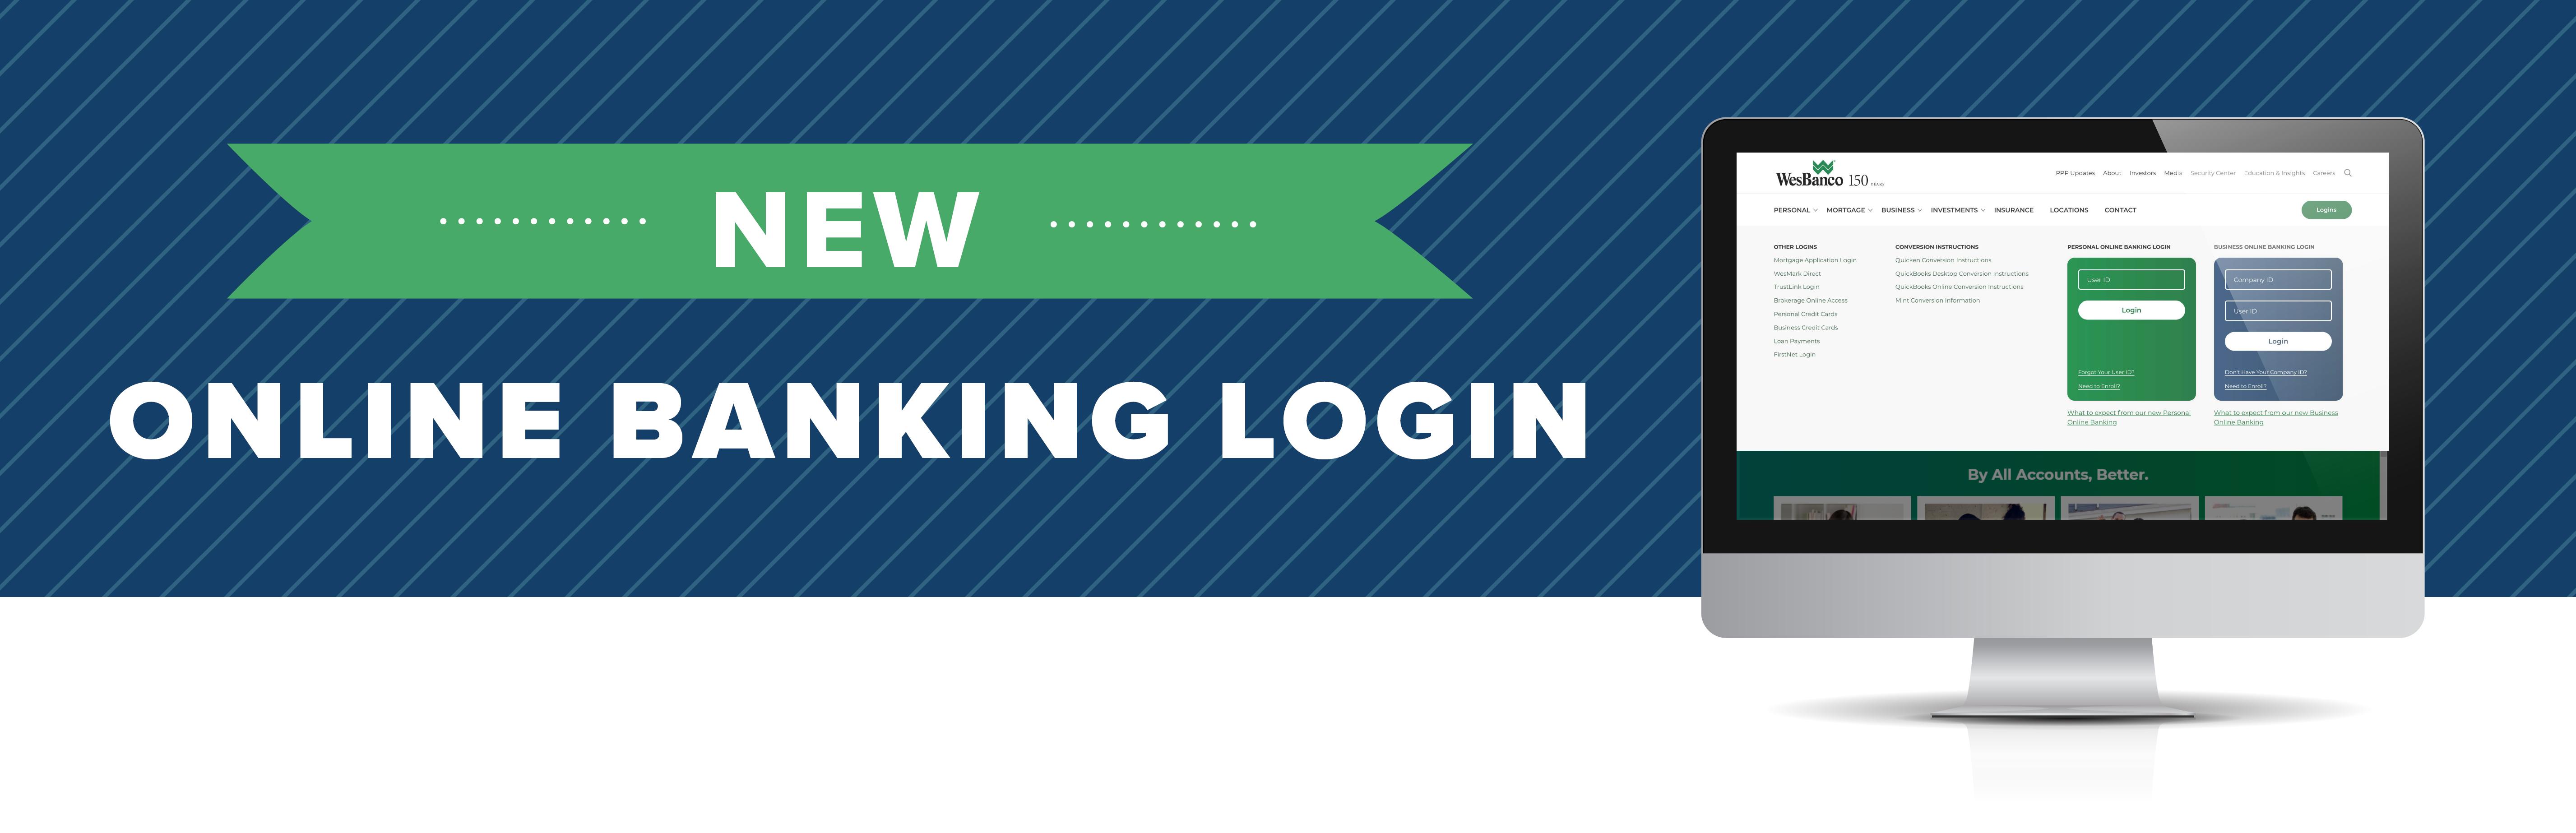 New - Online Banking Login